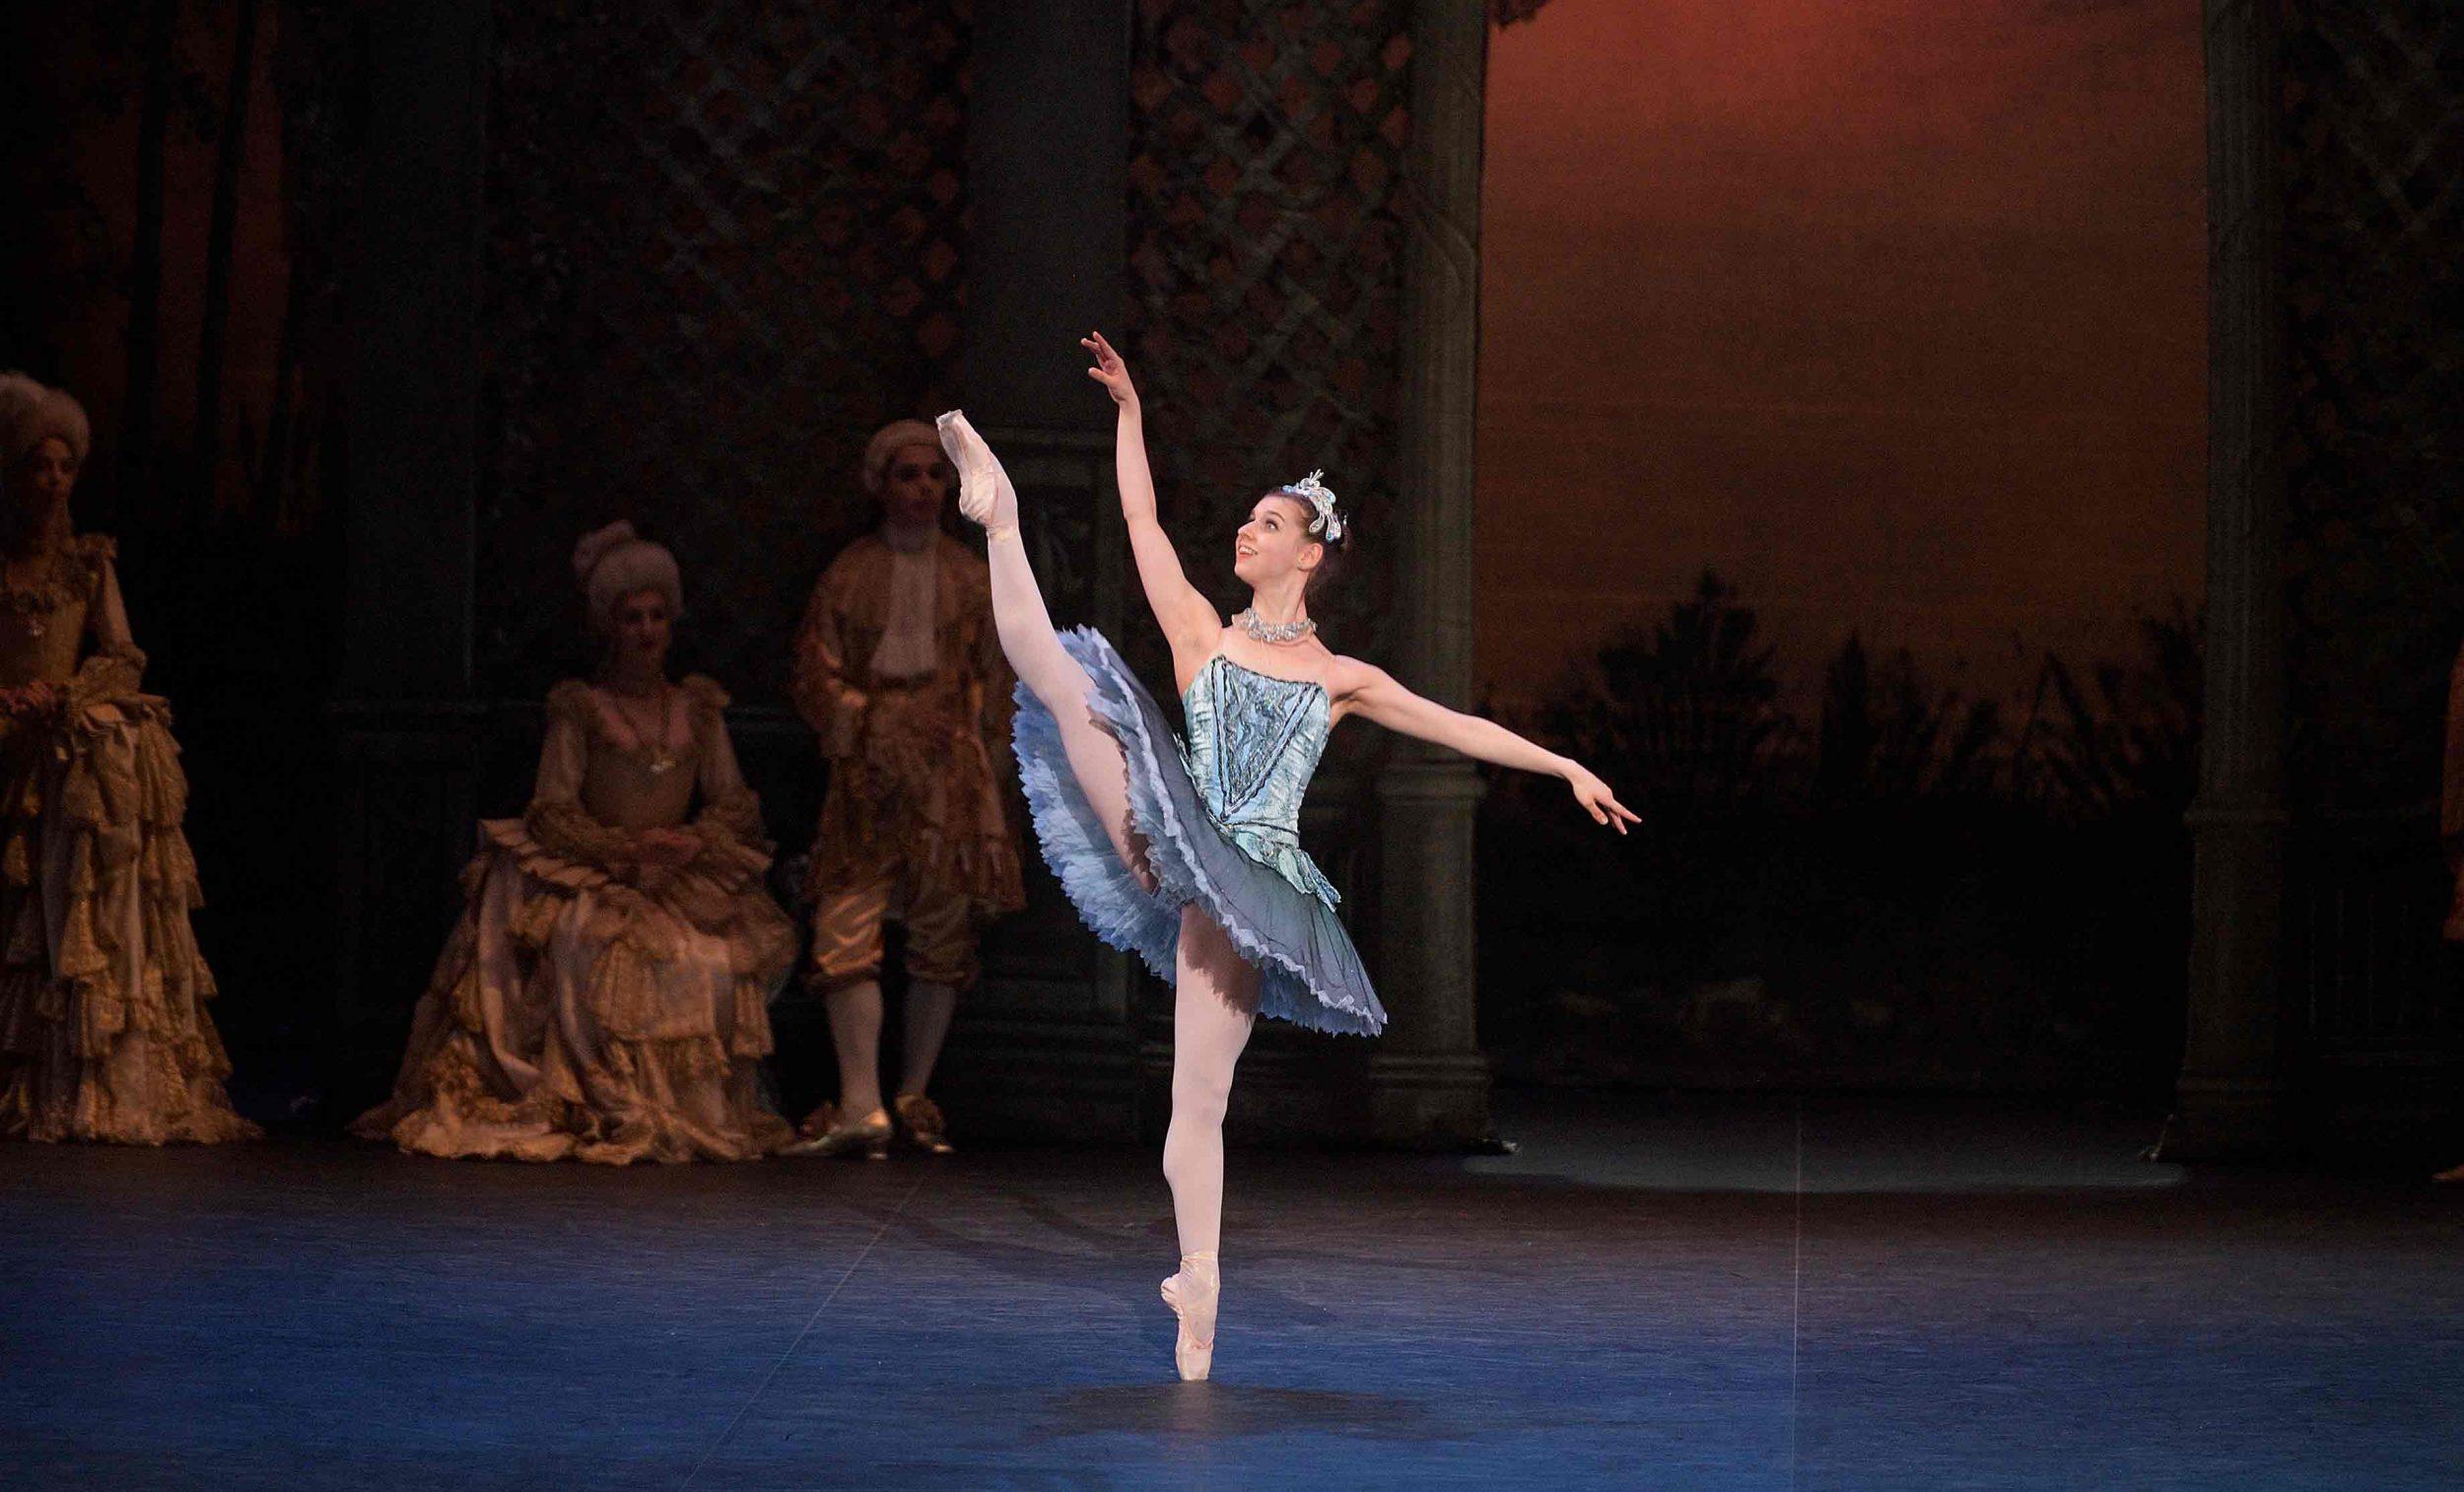 Julia-Conway-as-Princess-Florine-in-The-Sleeping-Beauty-©-Laurent-Liotardo_WEB